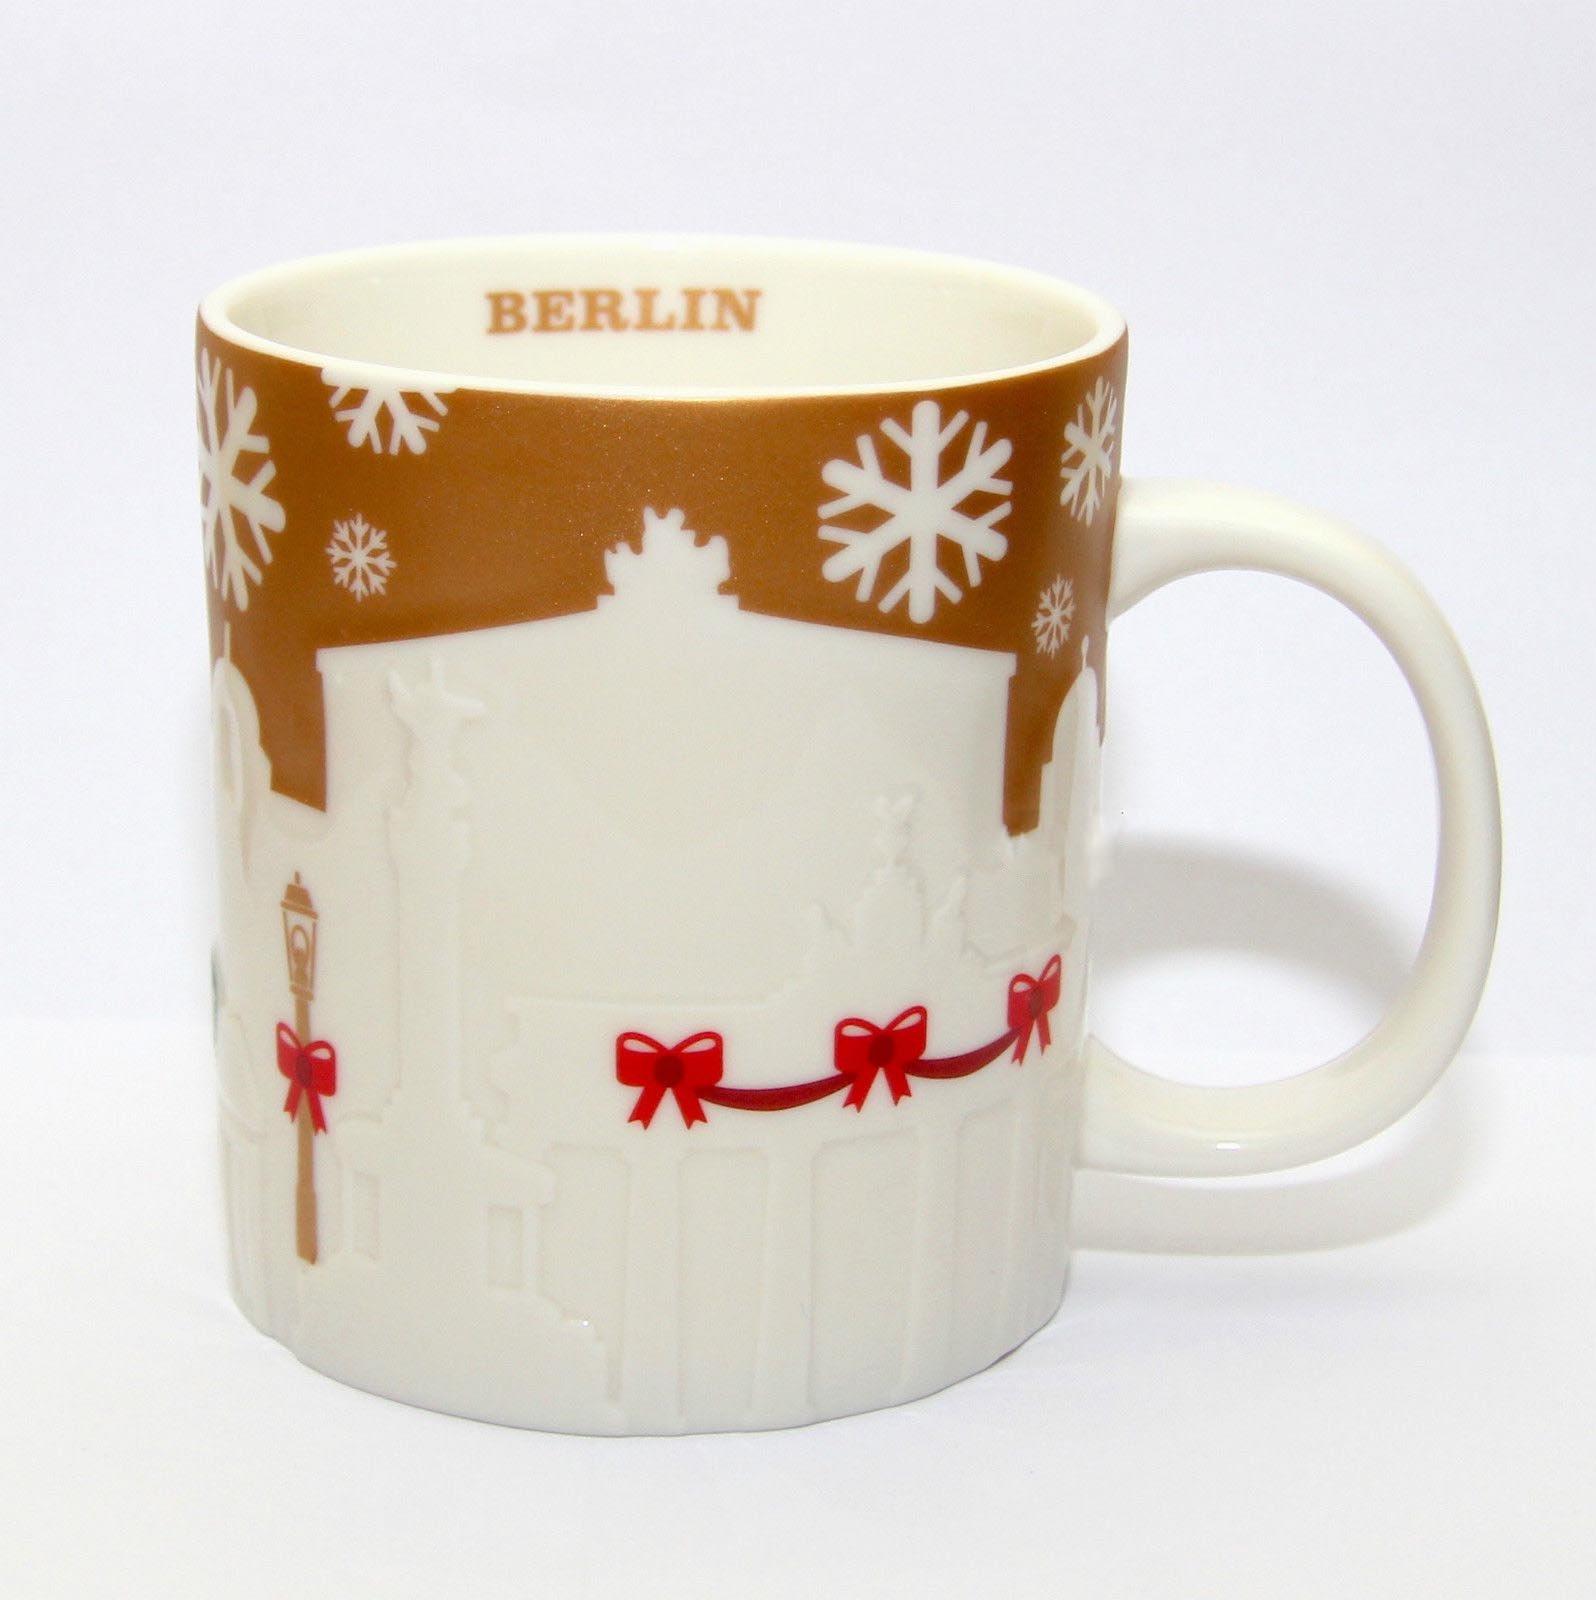 Starbucks 2014 Berlin Christmas Relief Mug Gold Limited Edition